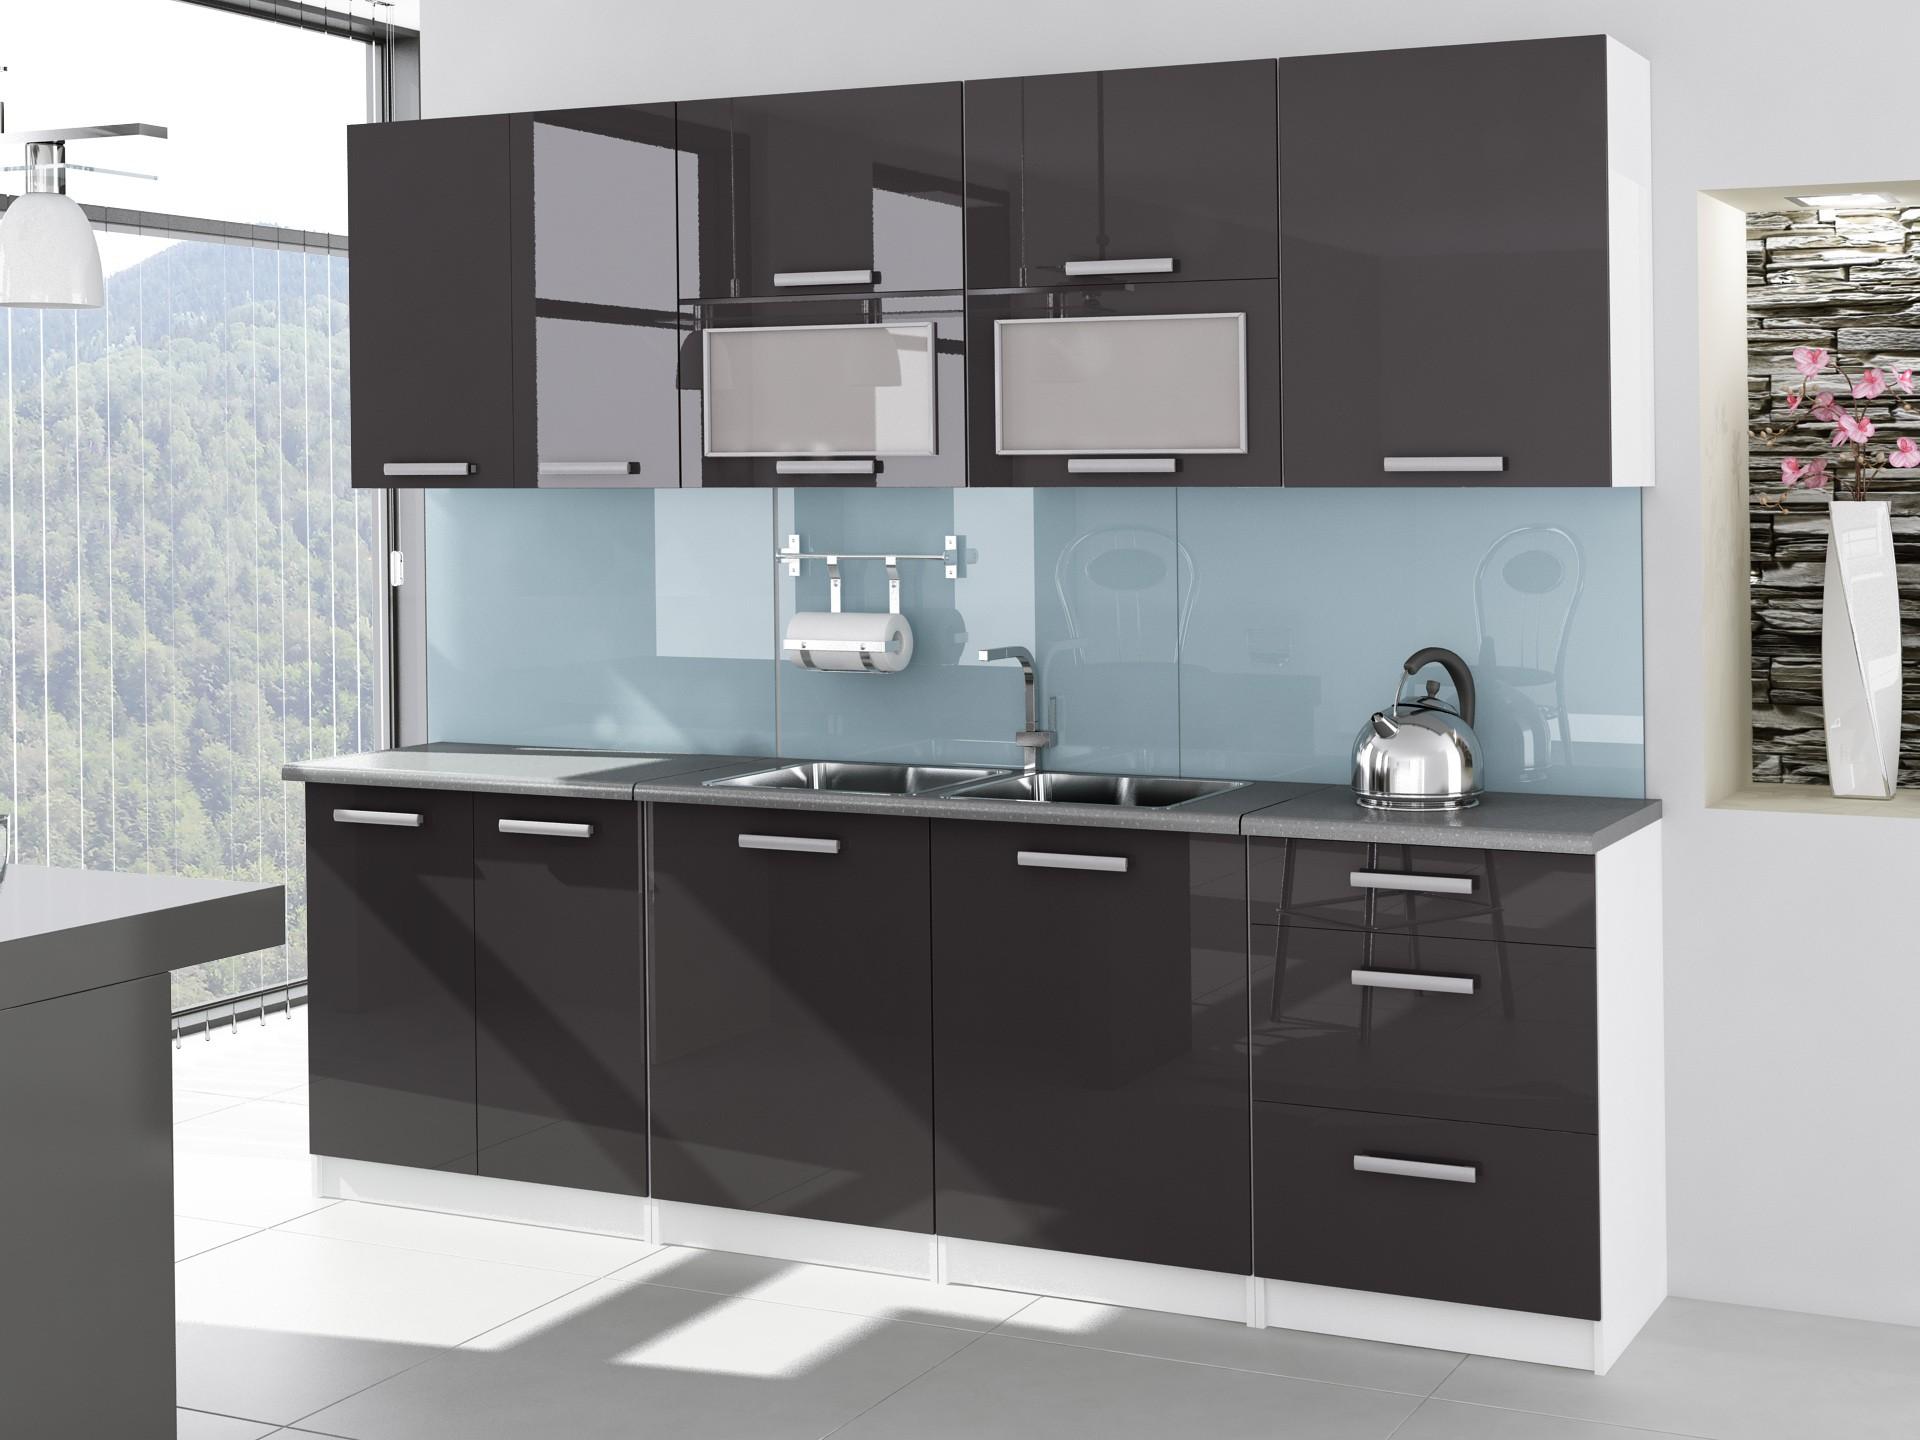 cuisine laqu e. Black Bedroom Furniture Sets. Home Design Ideas